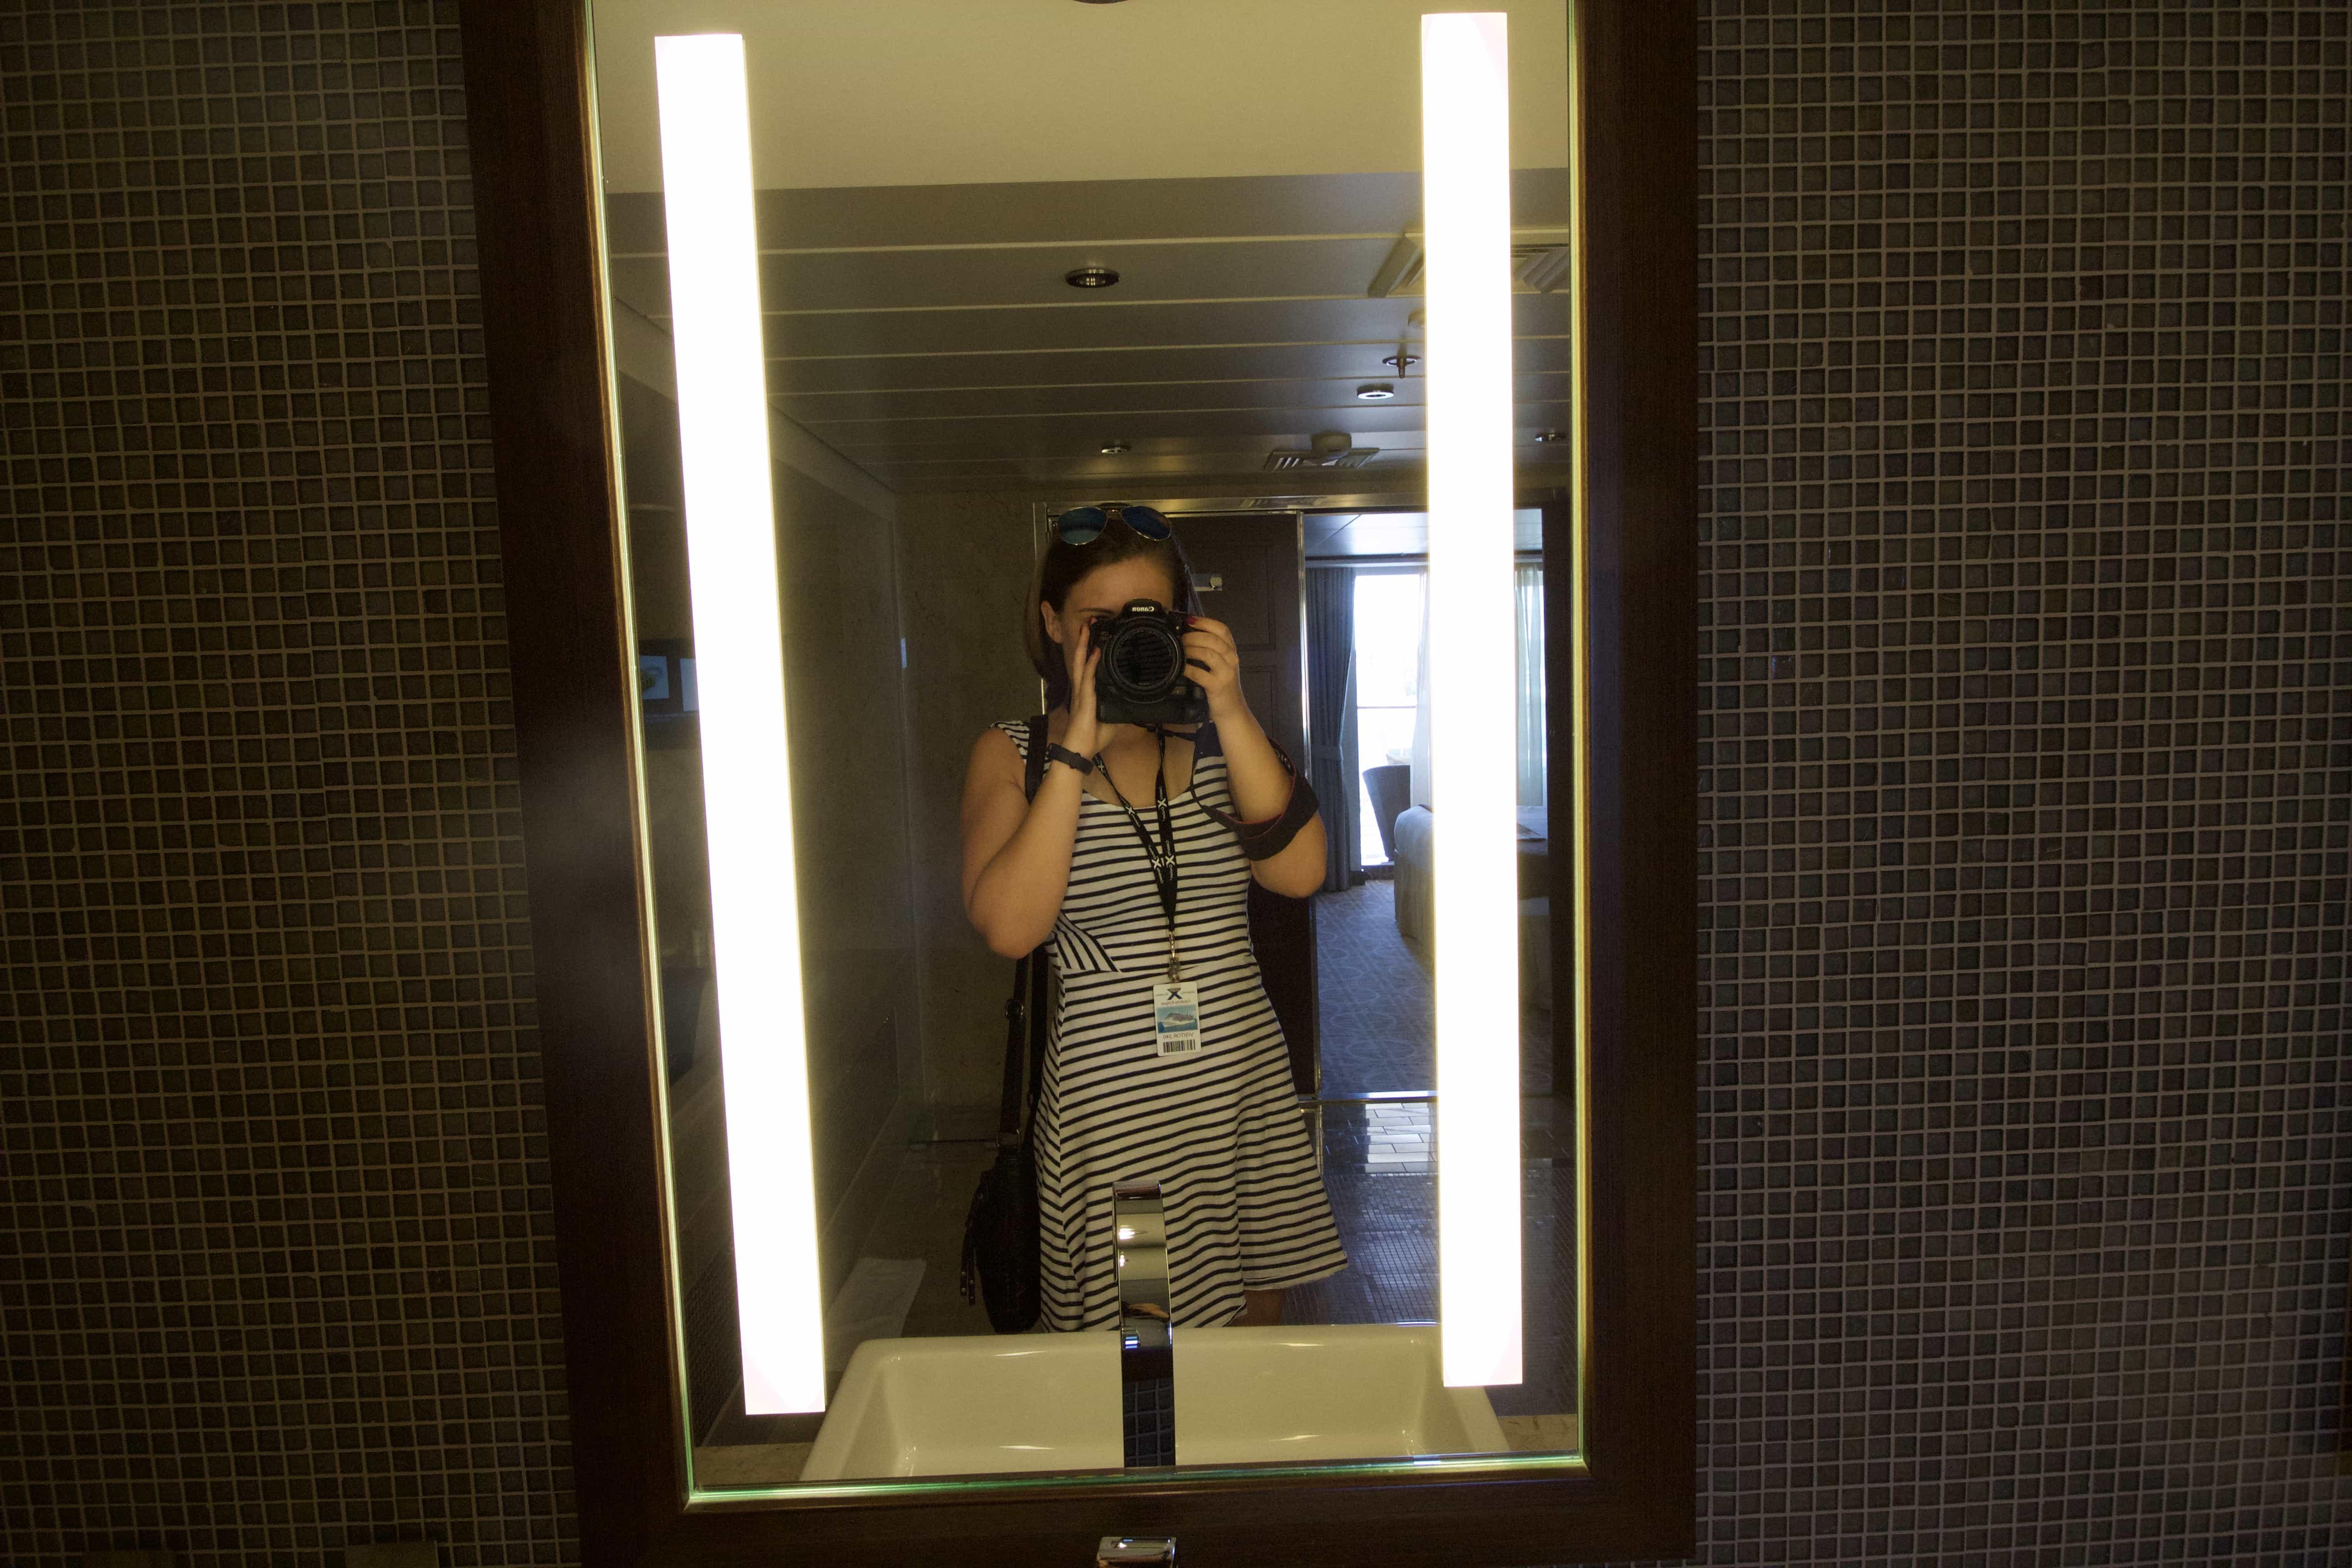 Celebrity Eclipse - Penthouse suite, me! girl selfie mirror photo canon 600D blogger